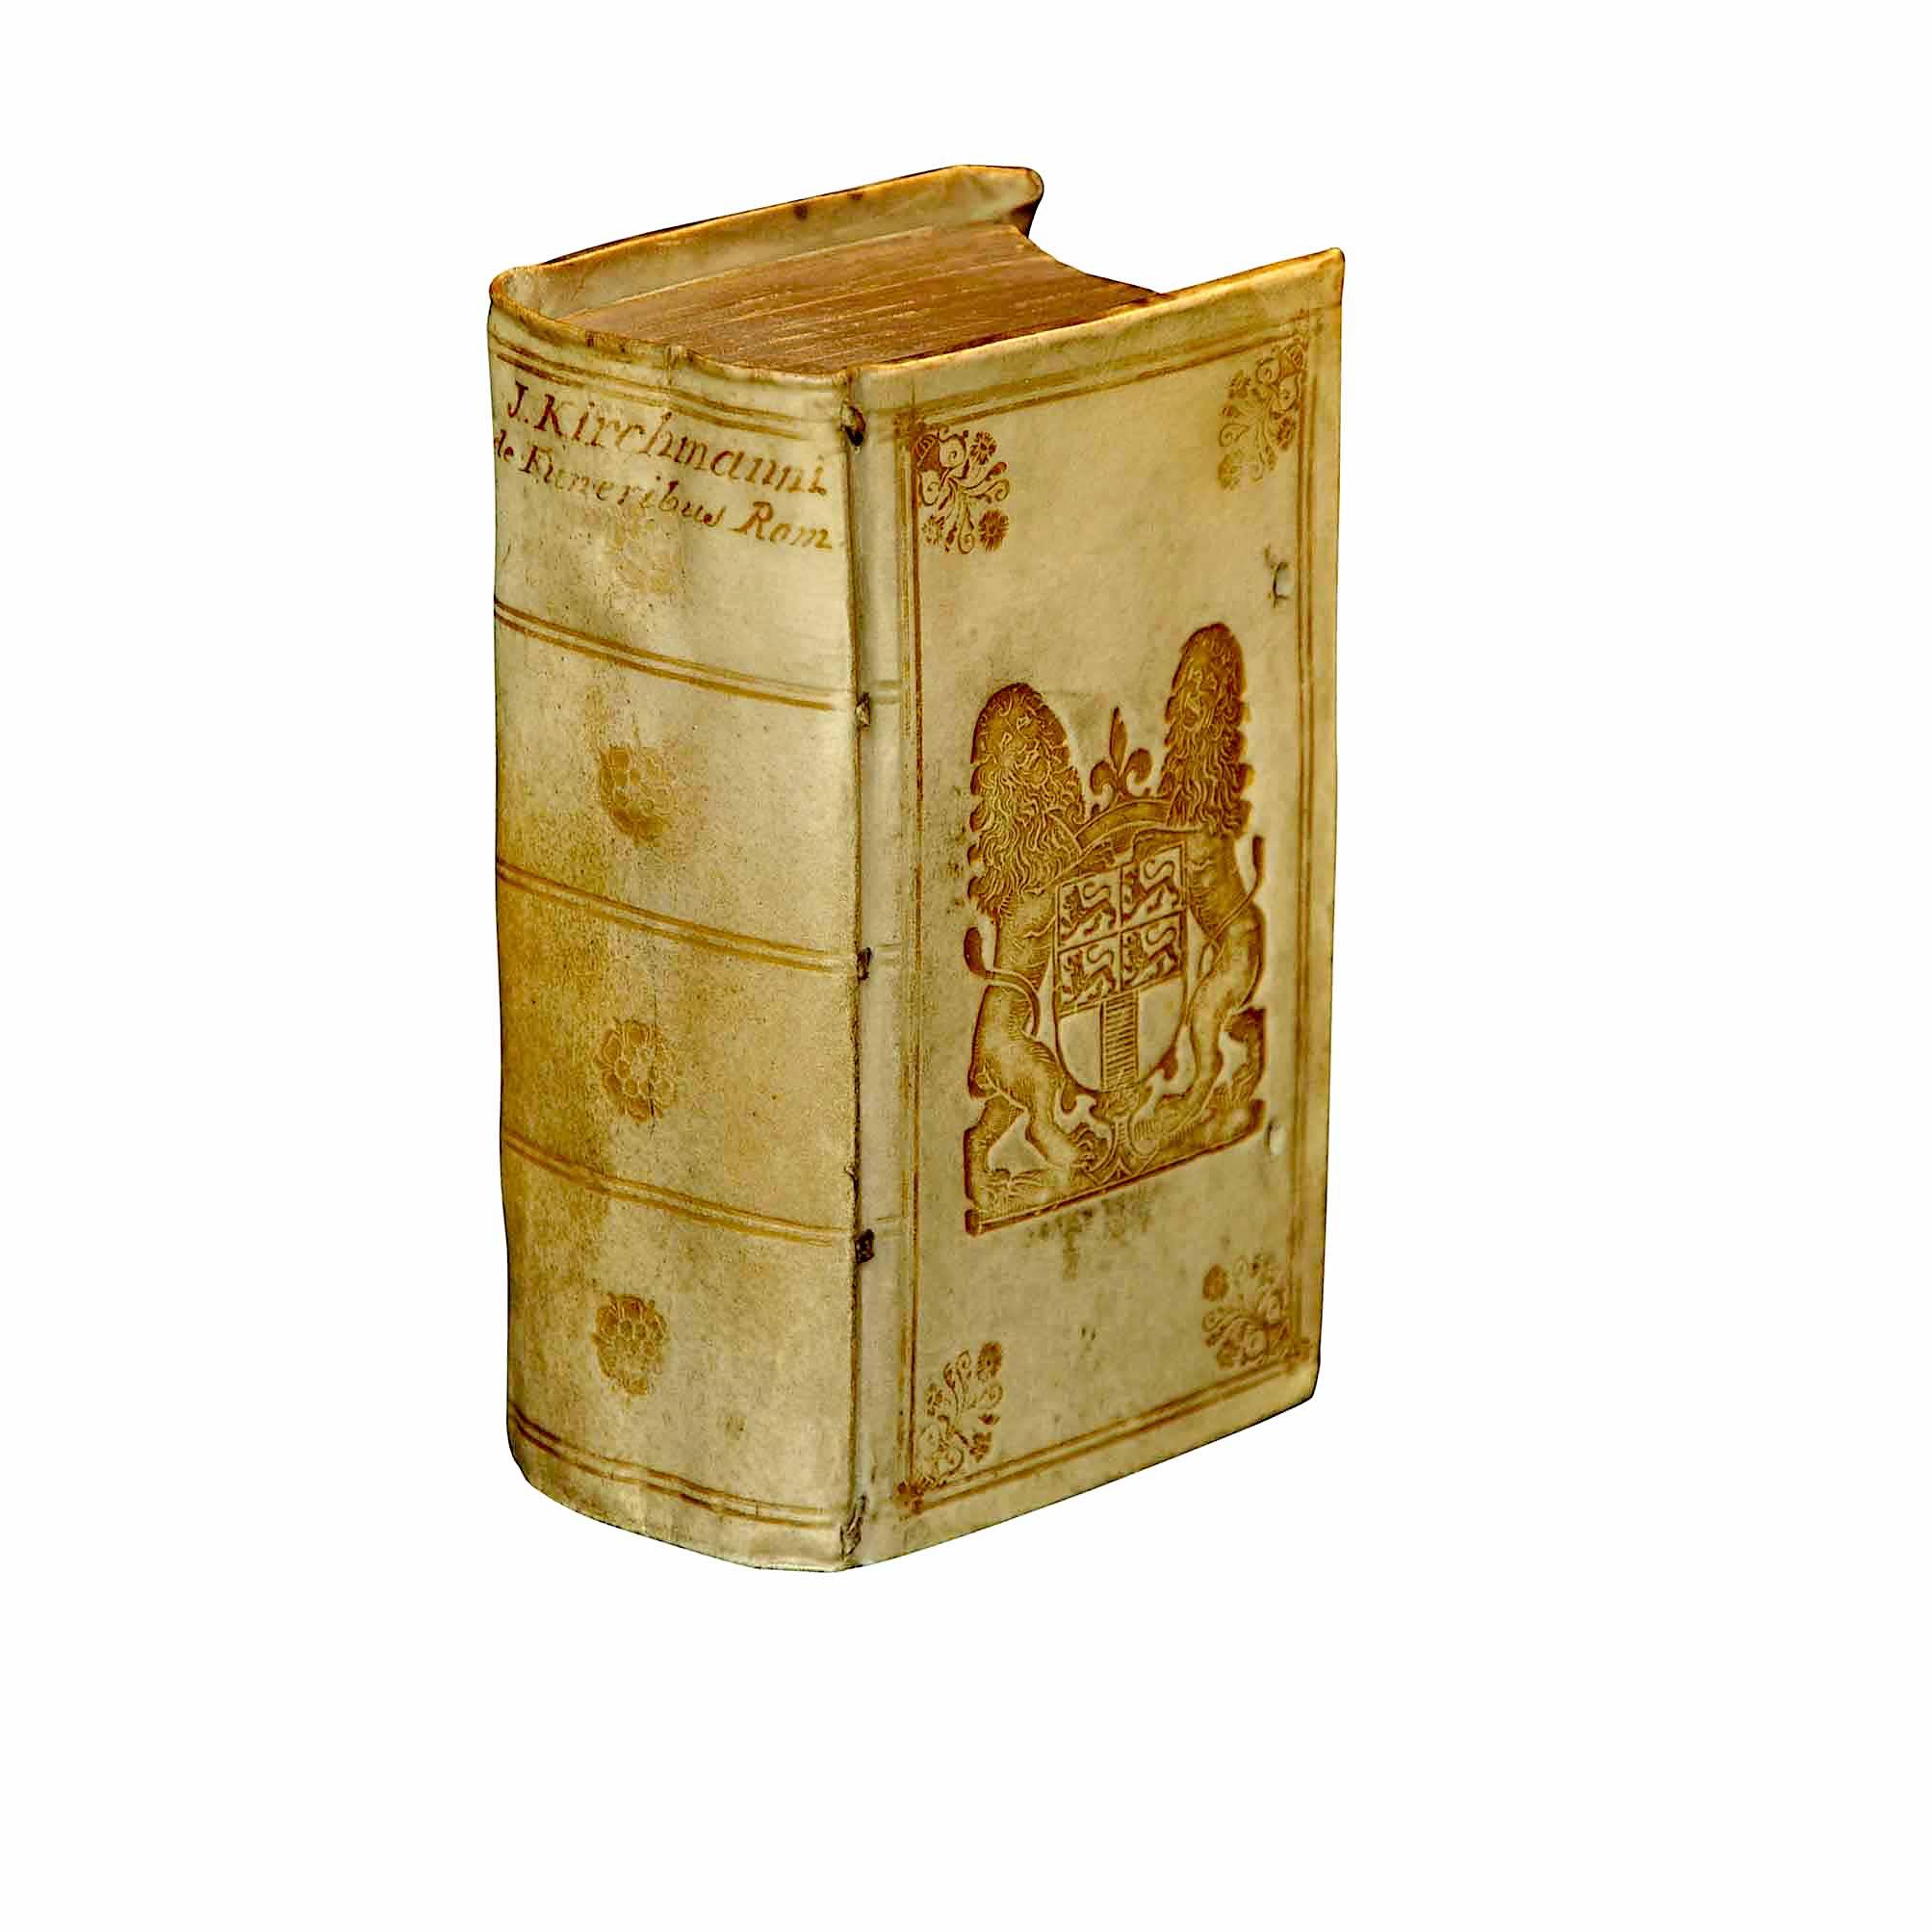 5897K Kirchmann De Funeribus Romanorum Prize Binding Provenance 1672 free N